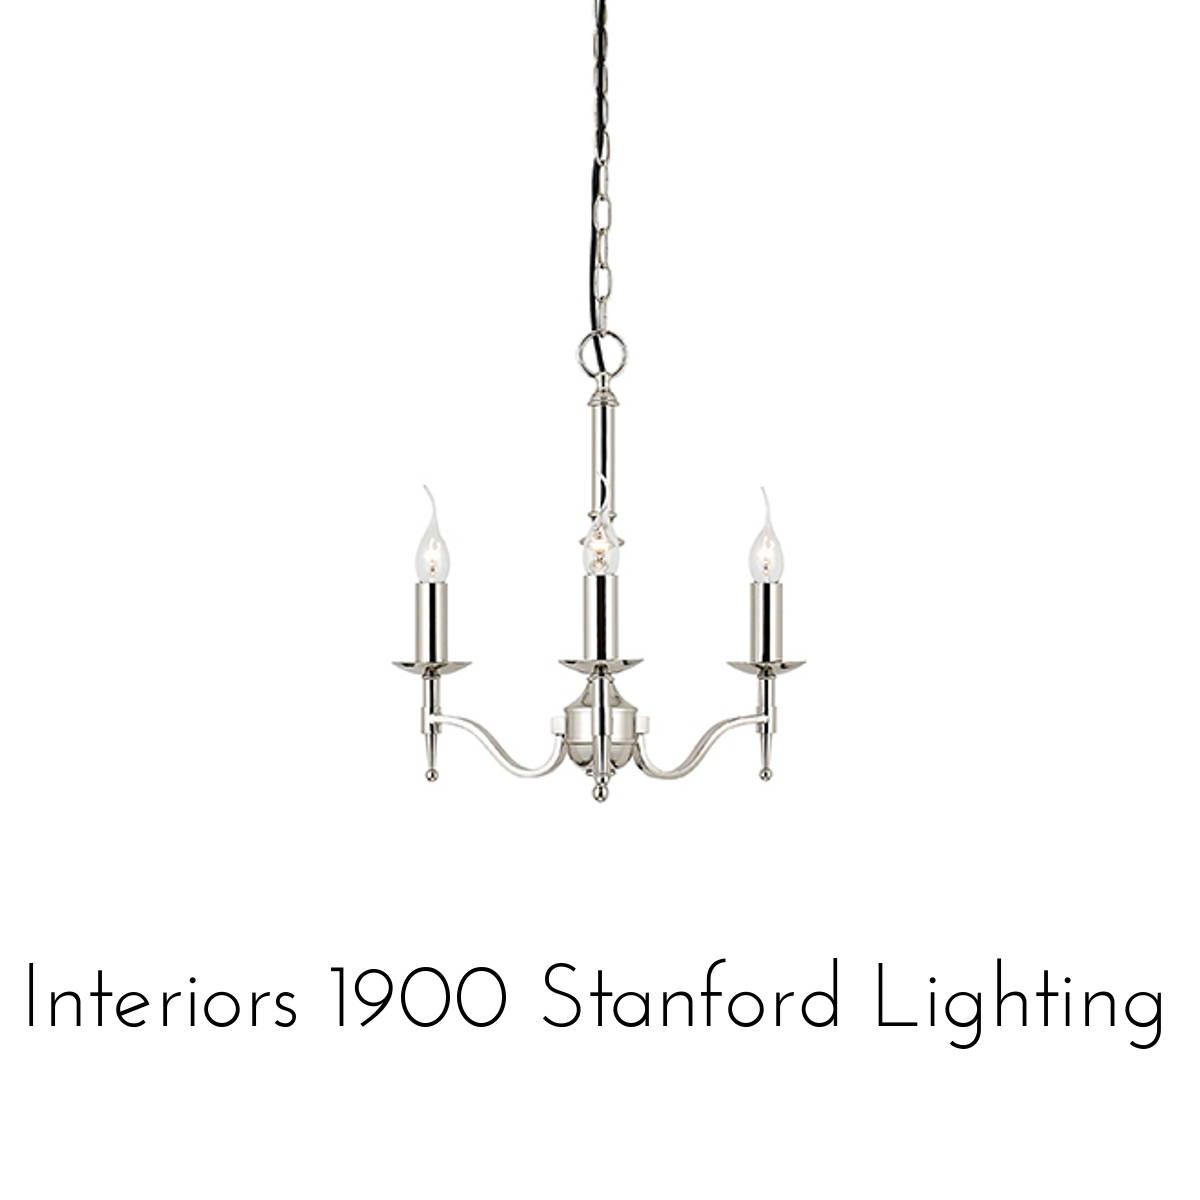 interiors 1900 stanford lighting